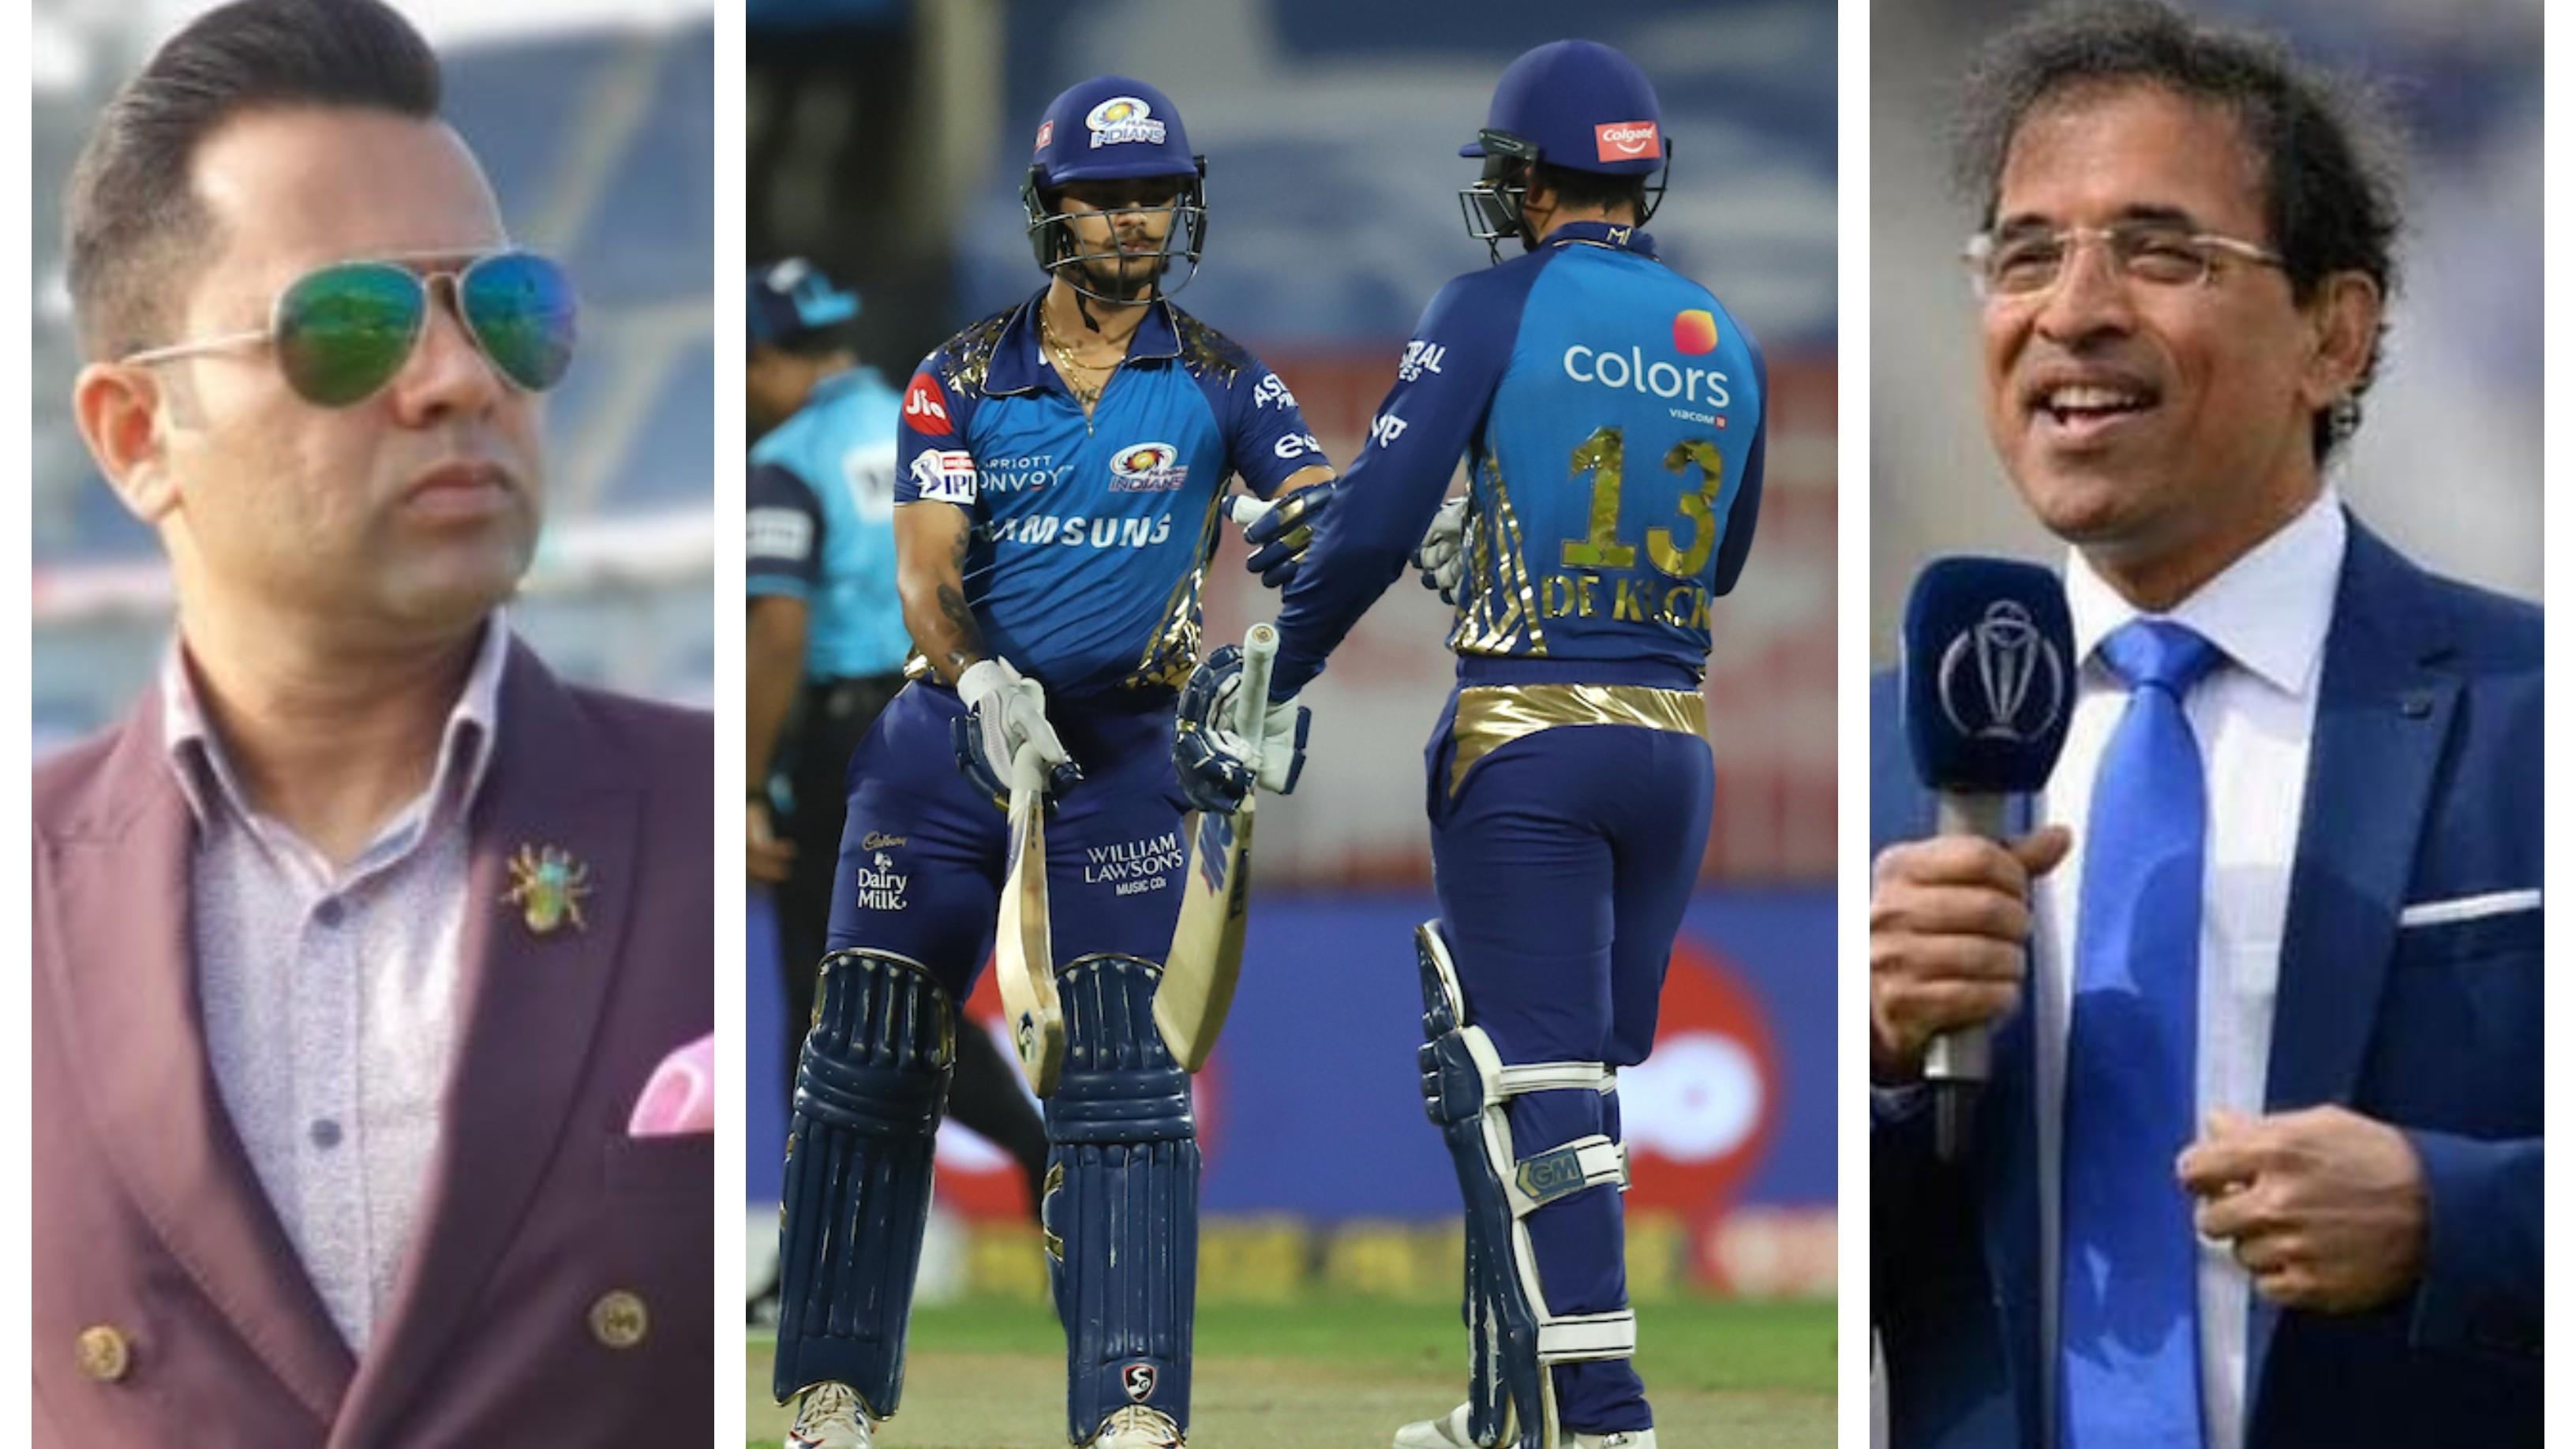 IPL 2020: Cricket fraternity reacts as Ishan Kishan slams 37-ball 68* to script MI's 10-wicket win over CSK